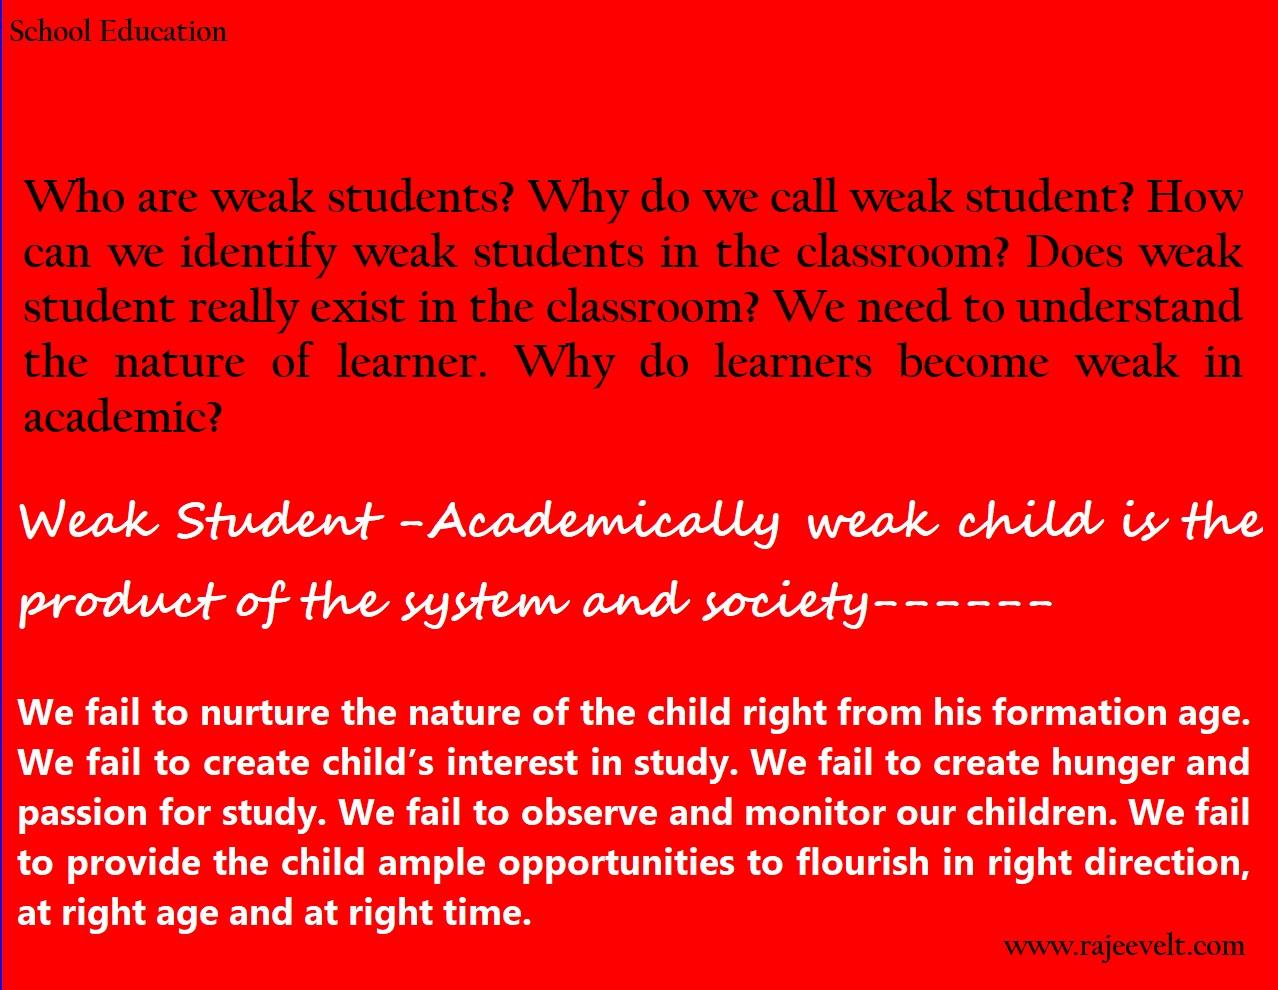 Weak Student